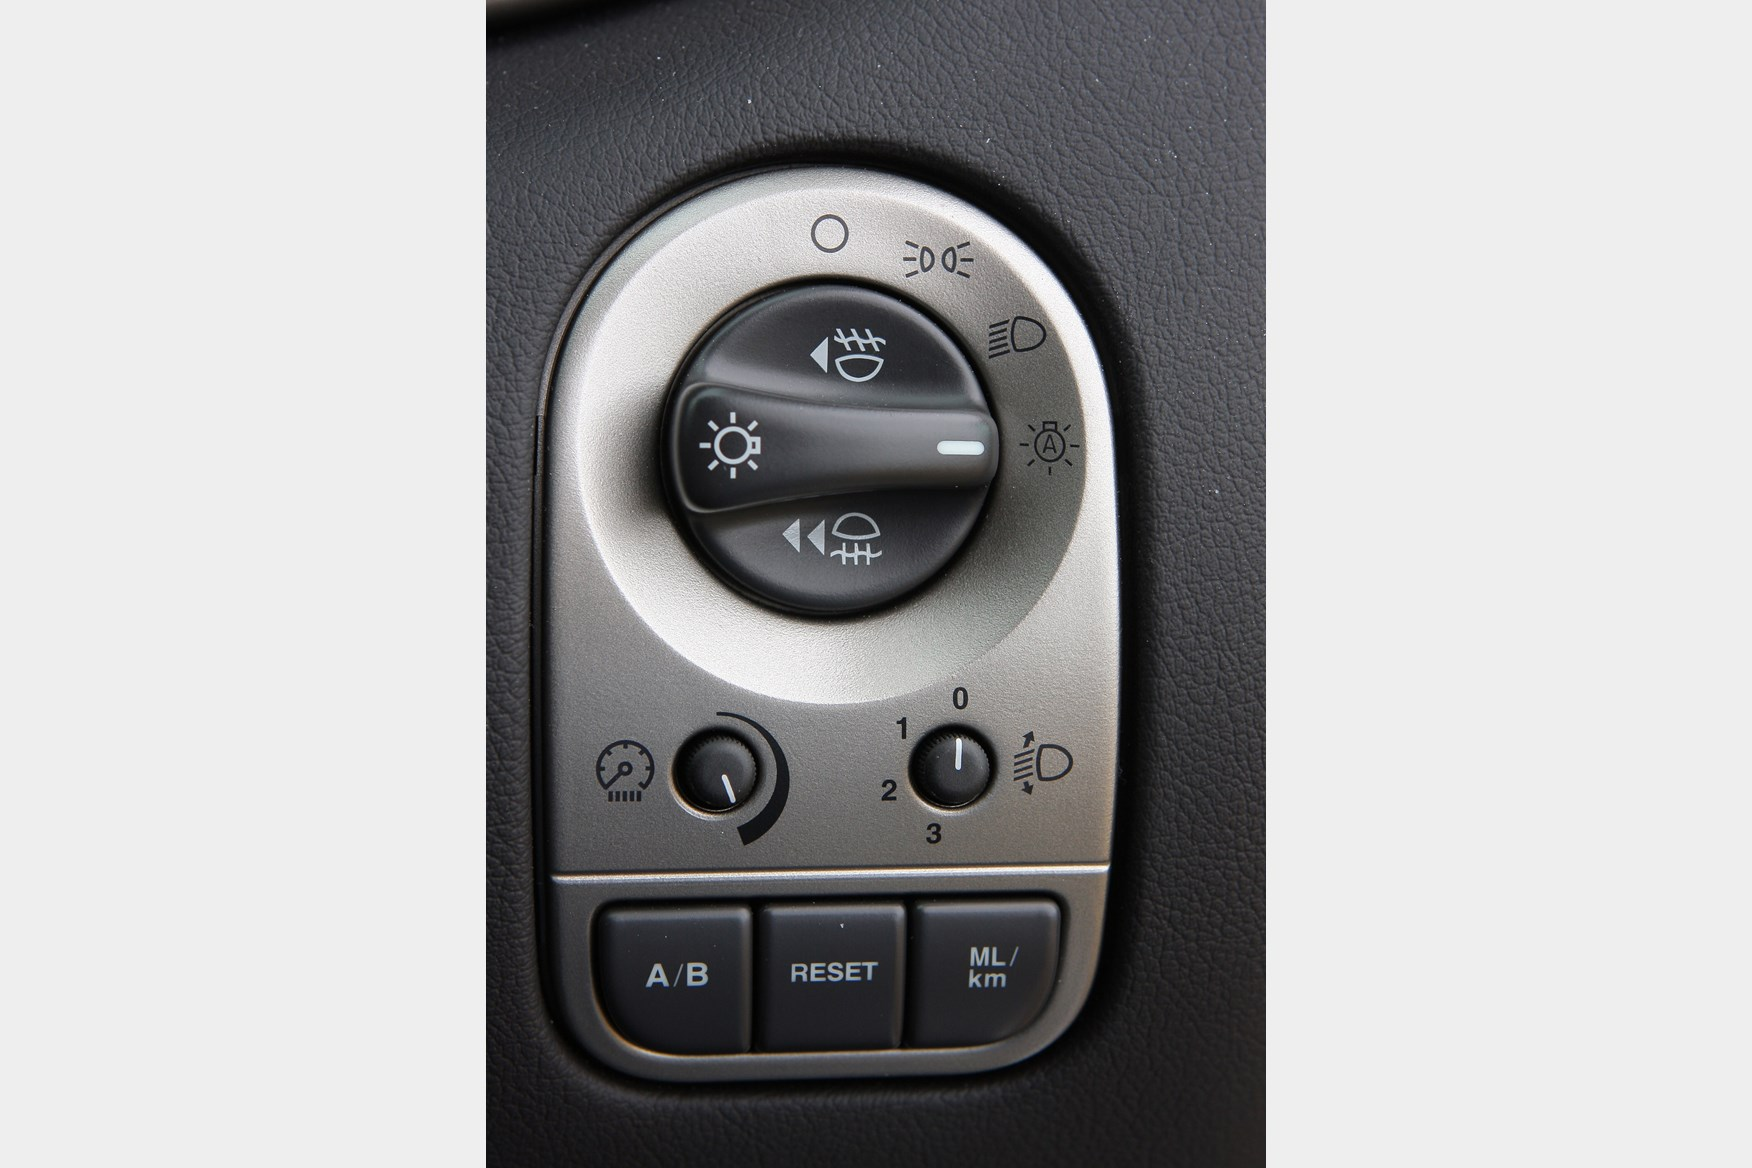 2010 Jaguar Xf Fuse Box Wiring Diagrams Volvo Xc60 Location